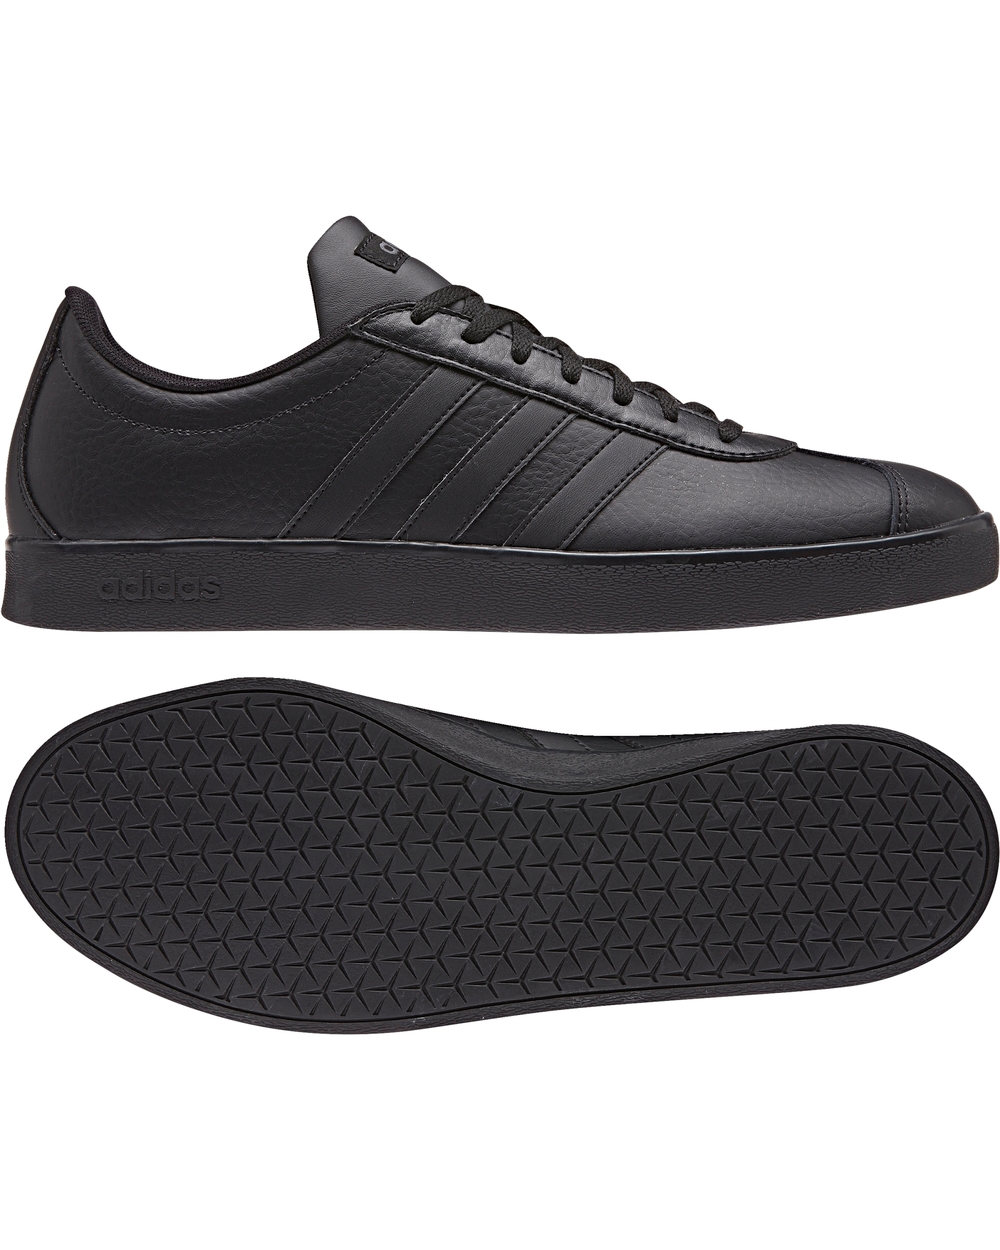 new style b3101 07eab Adidas Scarpe Sneakers Sportive Ginnastica Nero vl court 2.0 gazelle style  4 4 di 8 ...